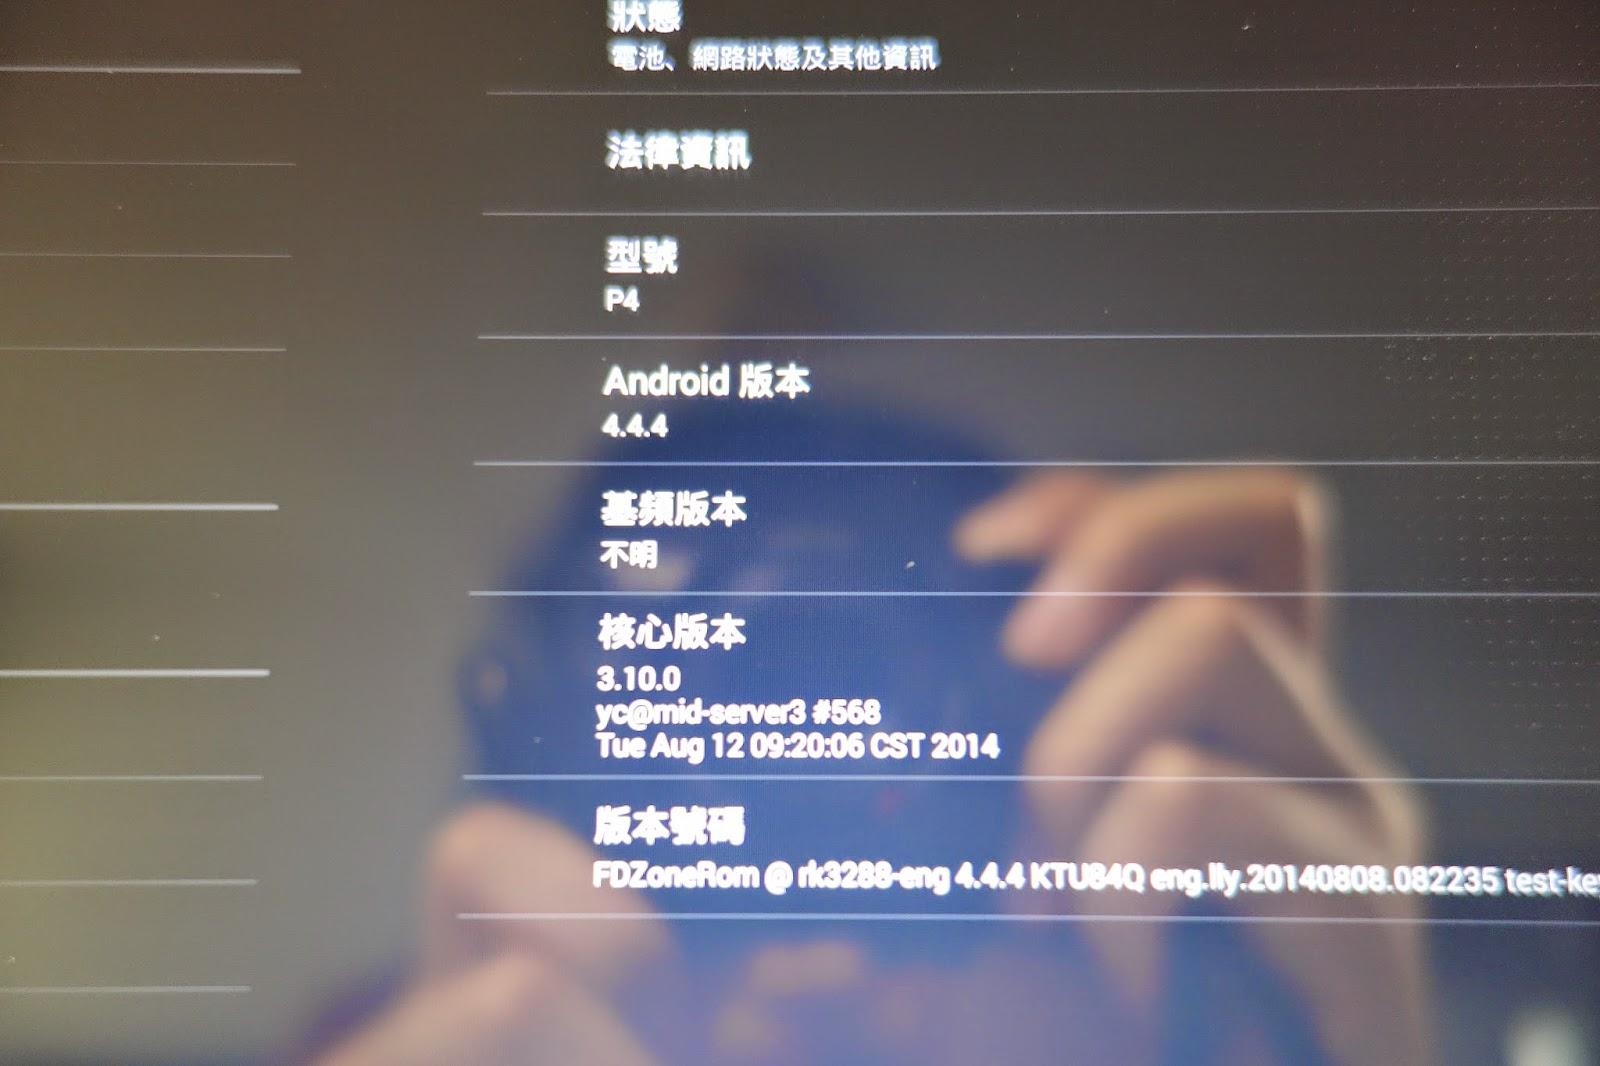 PIPO P4 8.9吋FHD+RK3288+2G RAM 高CP值平板開箱